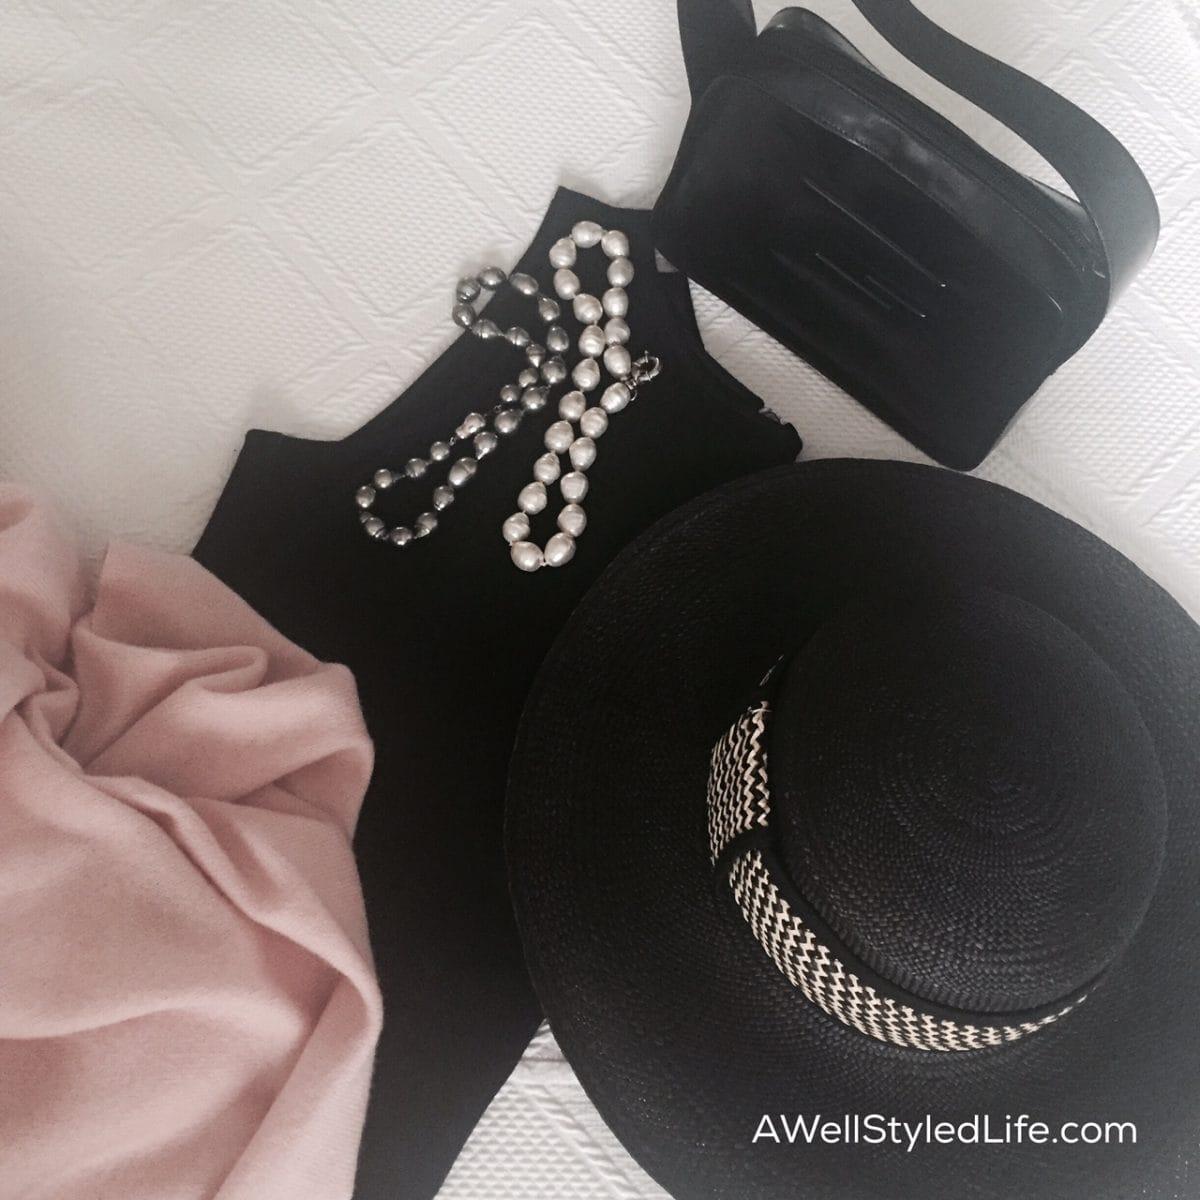 Dressing For Graduation for Women Over 50